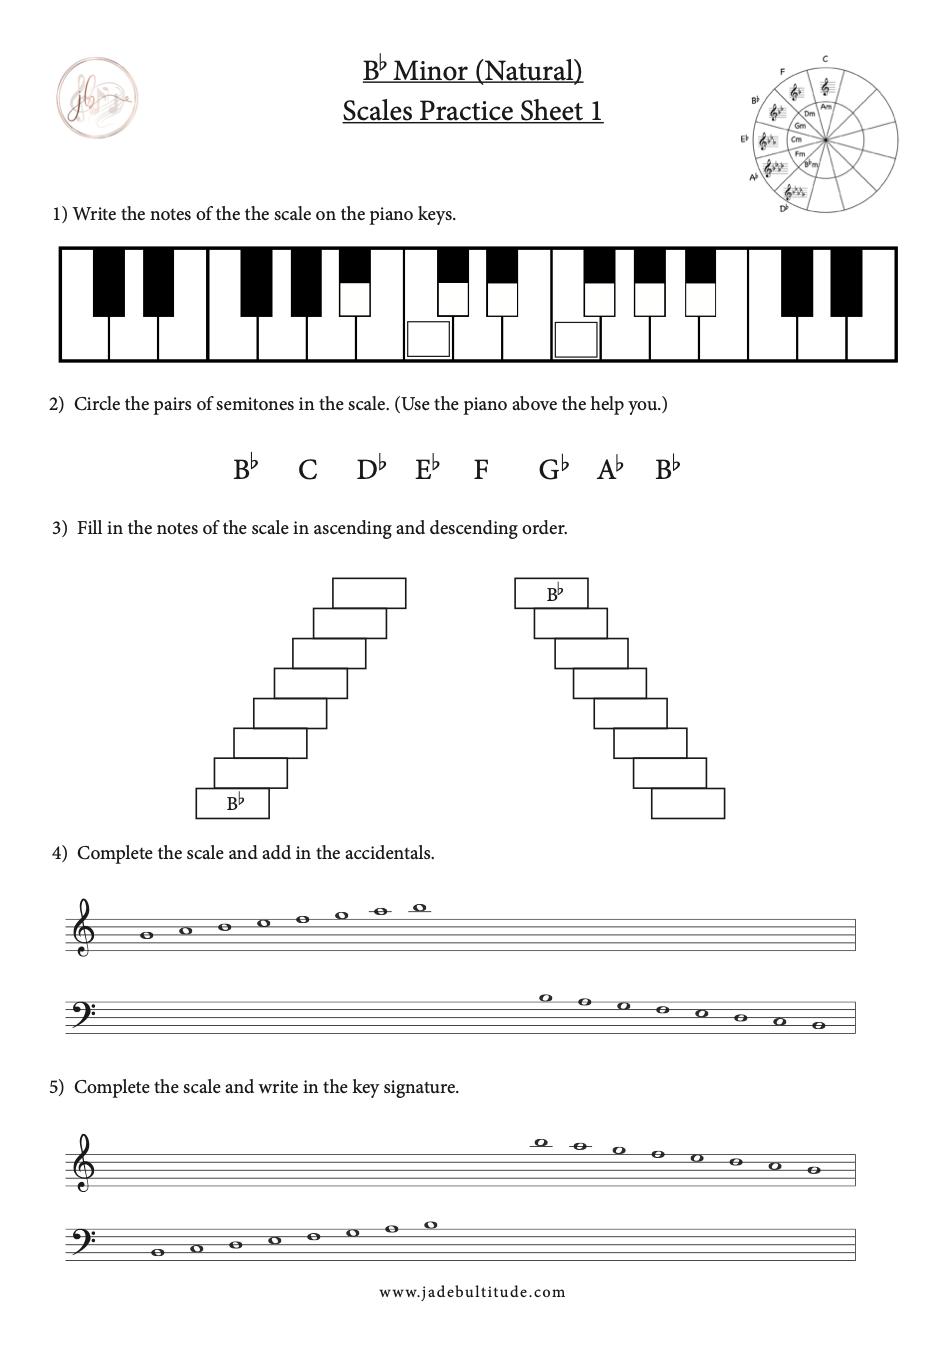 Bb Minor Natural Free Music Theory Worksheet Music Resource Music Theory Worksheets Printable Music Theory Worksheets Free Music Theory Worksheets [ 1356 x 950 Pixel ]